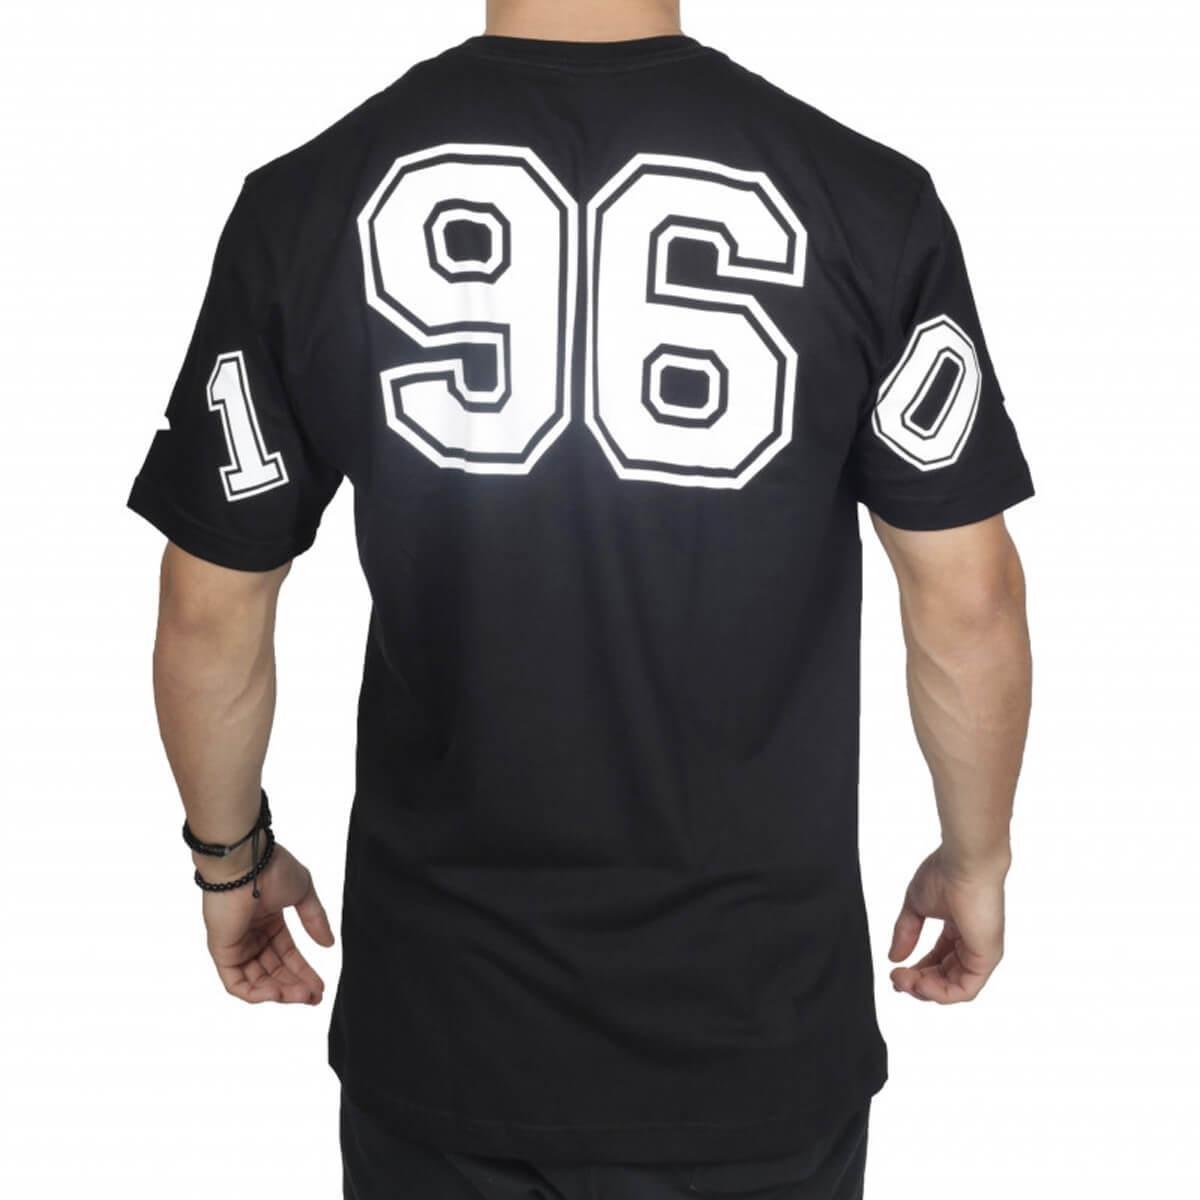 Oakland star Camiseta Raiders New star Preto Era NFL Number Oakland Camiseta Number Raiders wx848qrgXn